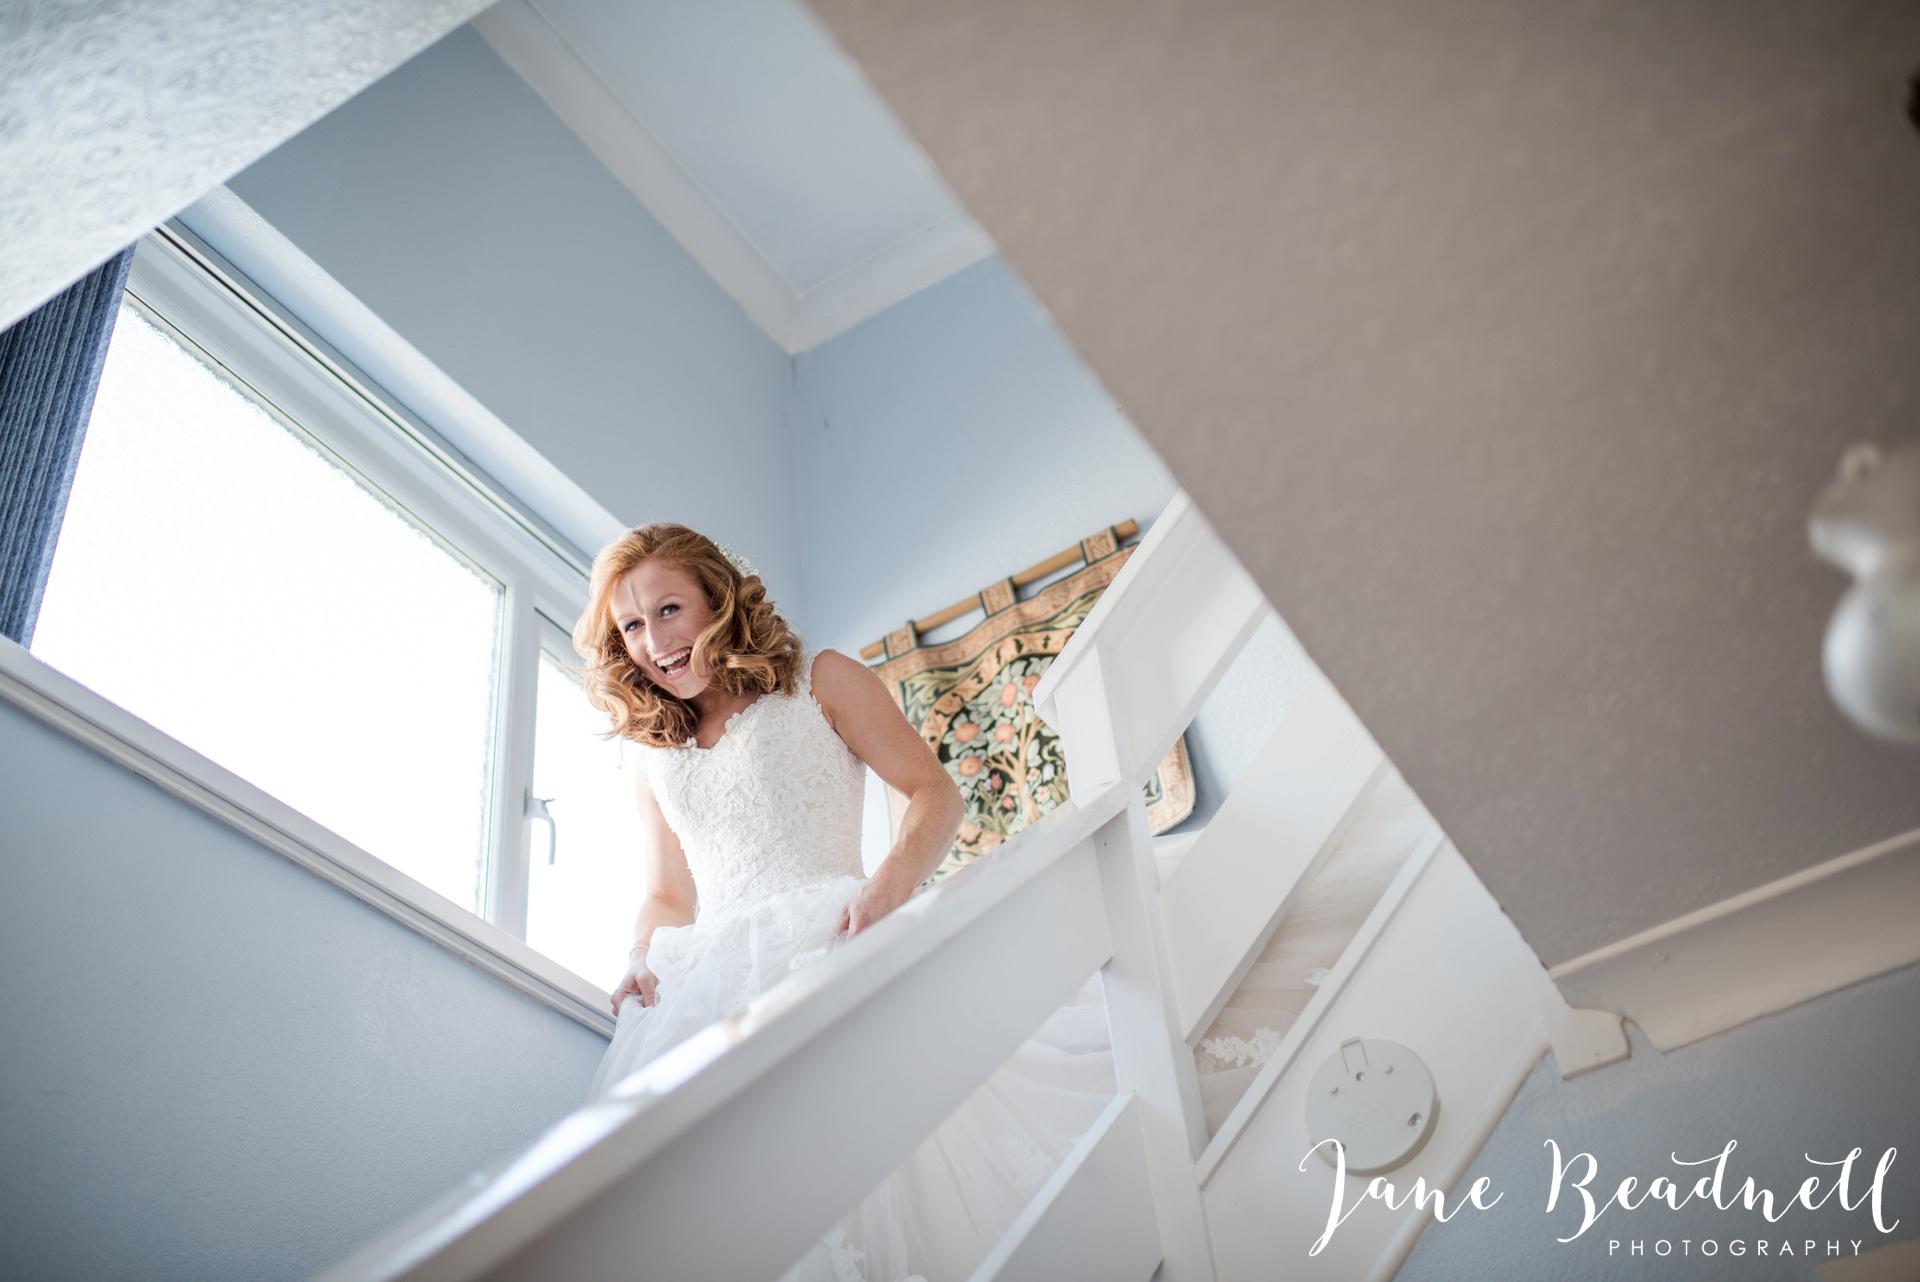 yorkshire-fine-art-wedding-photographer-jane-beadnell-photography-poppleton-york_0010